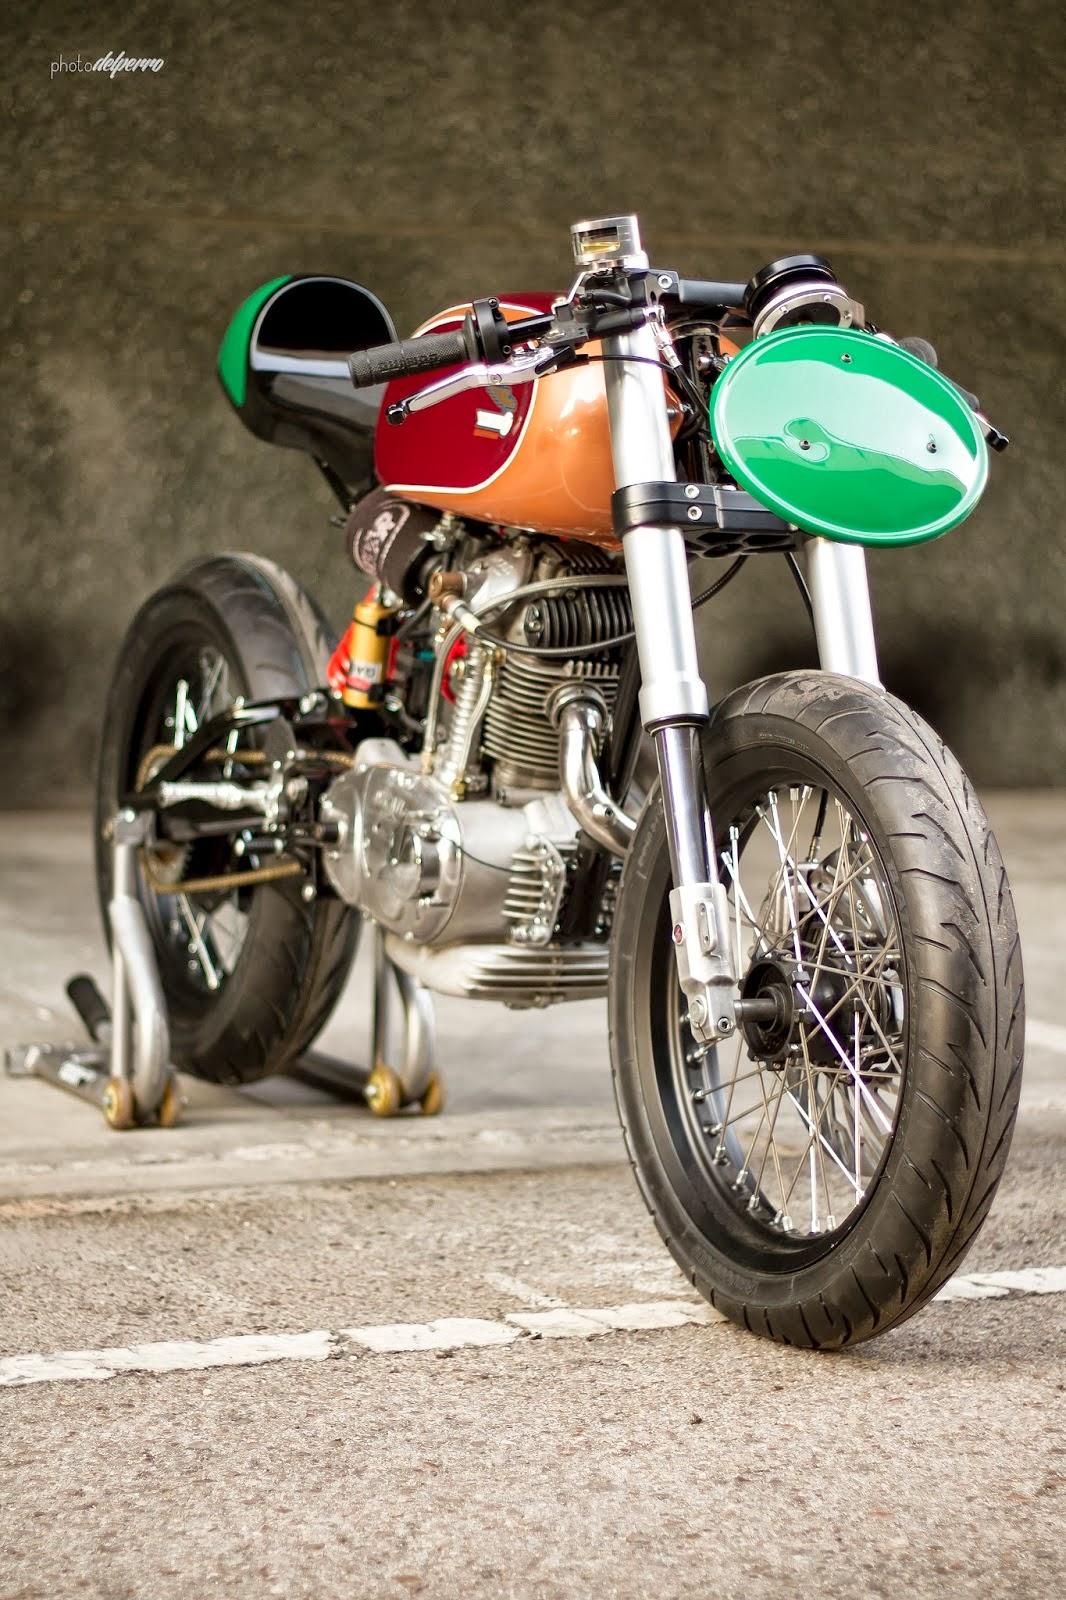 Ducati+F3+by+Radical+Ducati+06 Yamaha Xt E Wiring Diagram on vt 600 wiring diagram, xb 600 wiring diagram, xt 250 wiring diagram, xt 600 brake pads, hp 600 wiring diagram, vx 600 wiring diagram, xt 500 wiring diagram, fzr 600 wiring diagram,